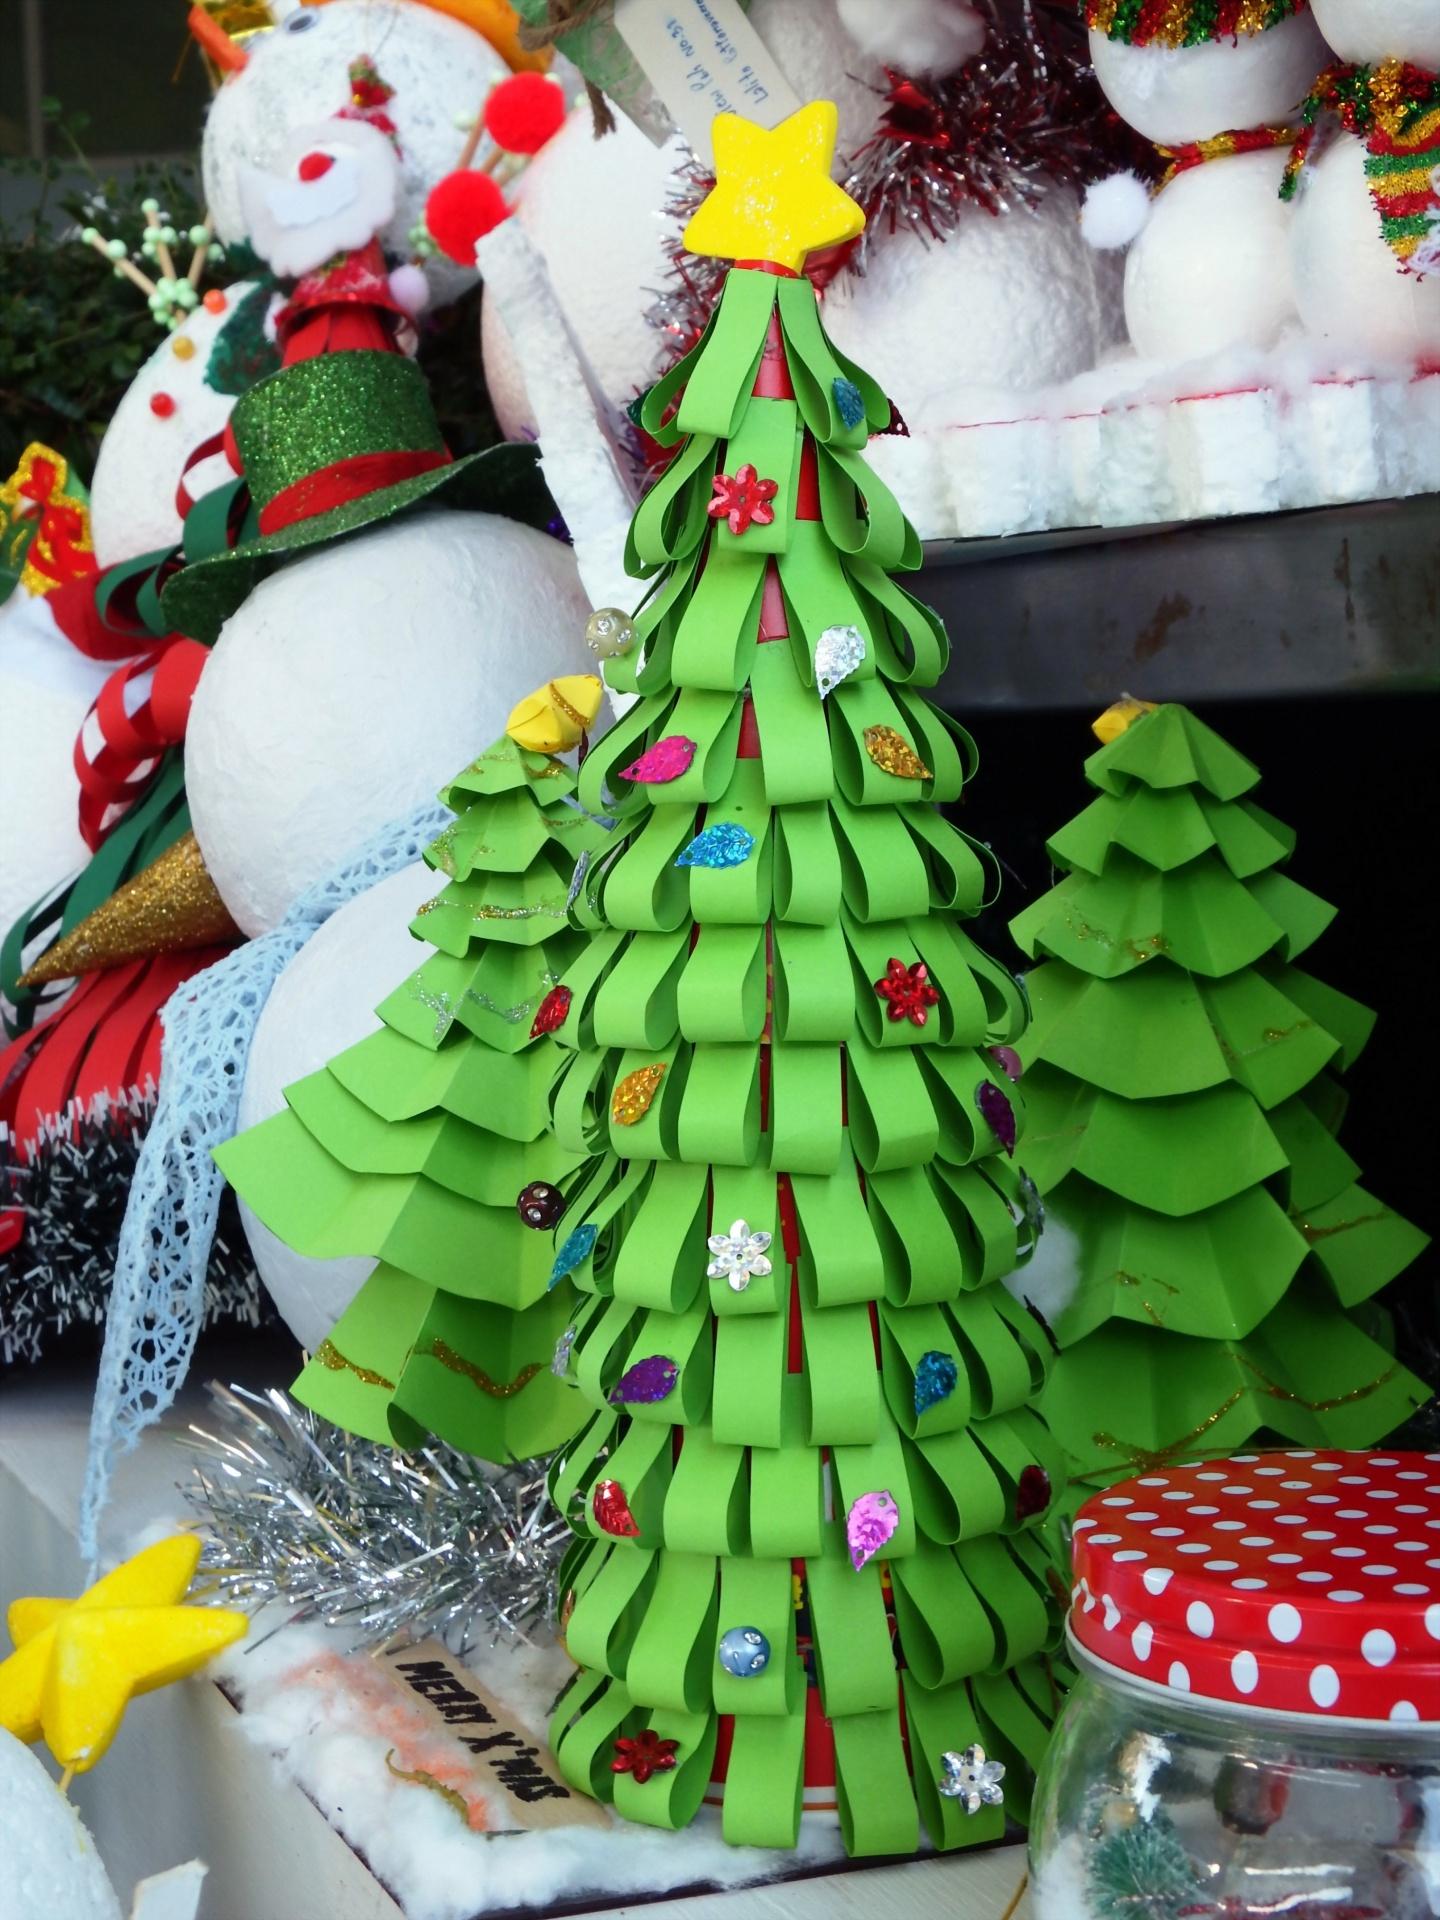 Children Christmas Tree Decorations.Paper Craft Christmas Xmas Tree Free Photo From Needpix Com